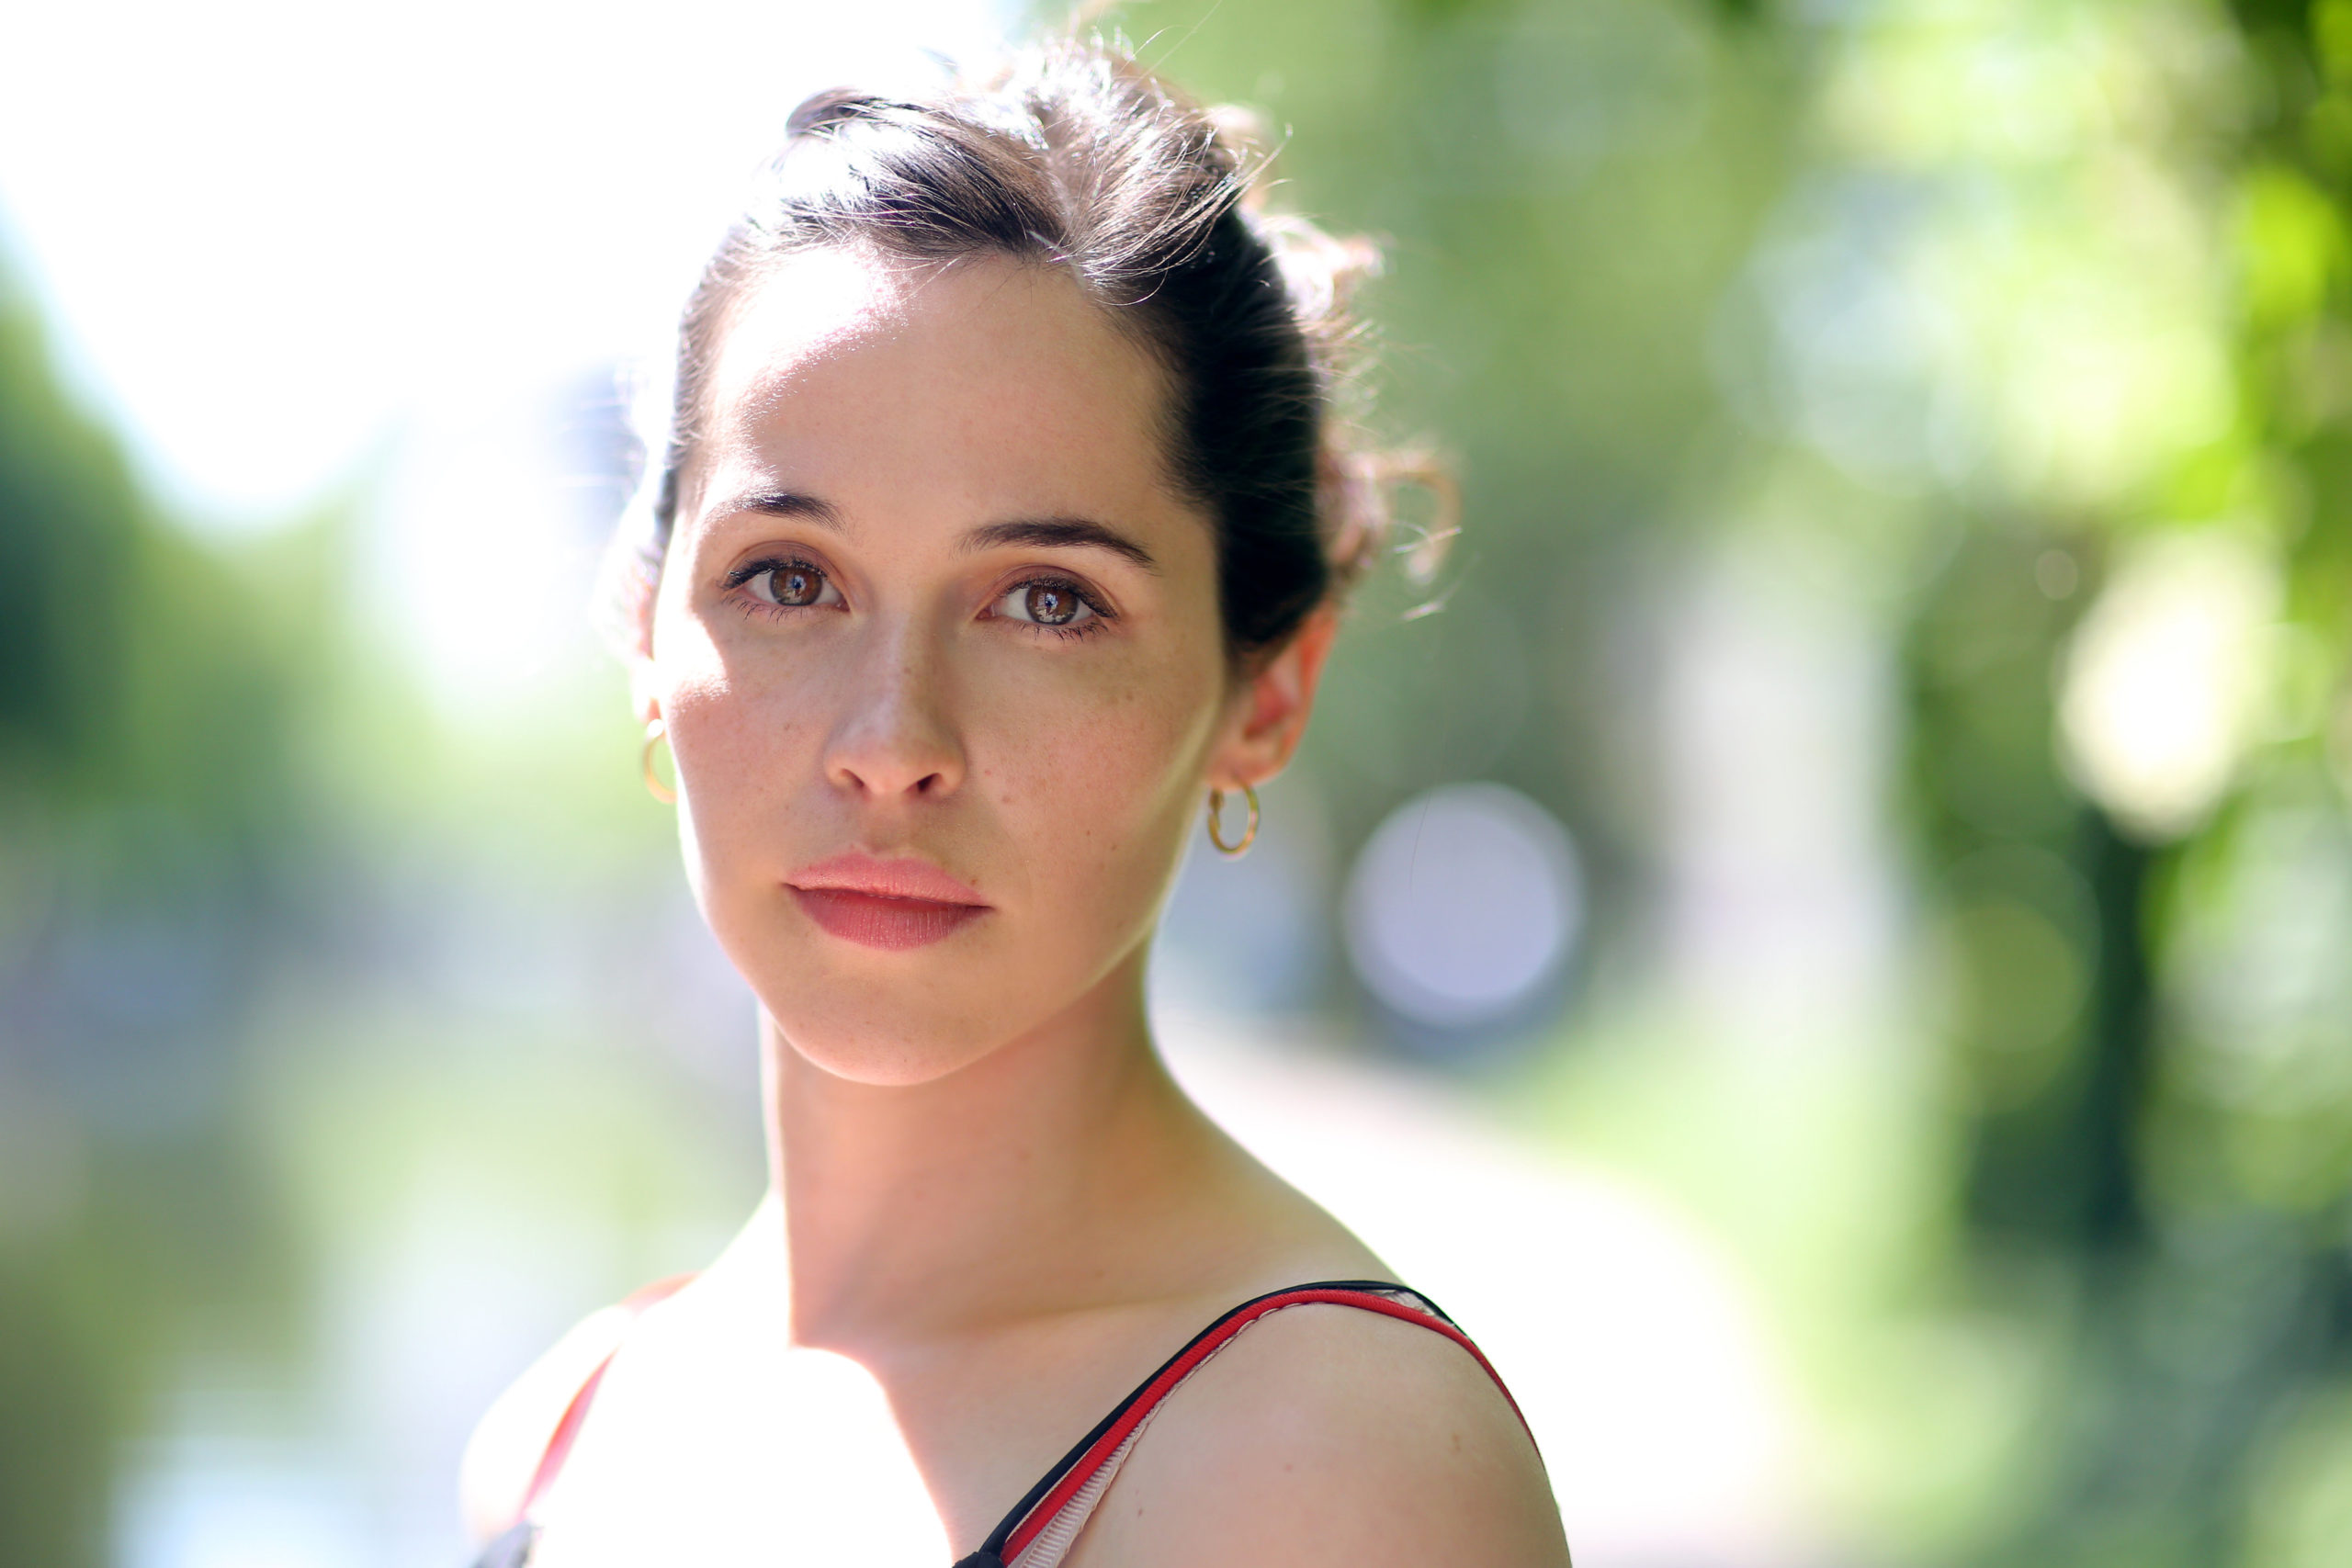 Stephanie Dufresne